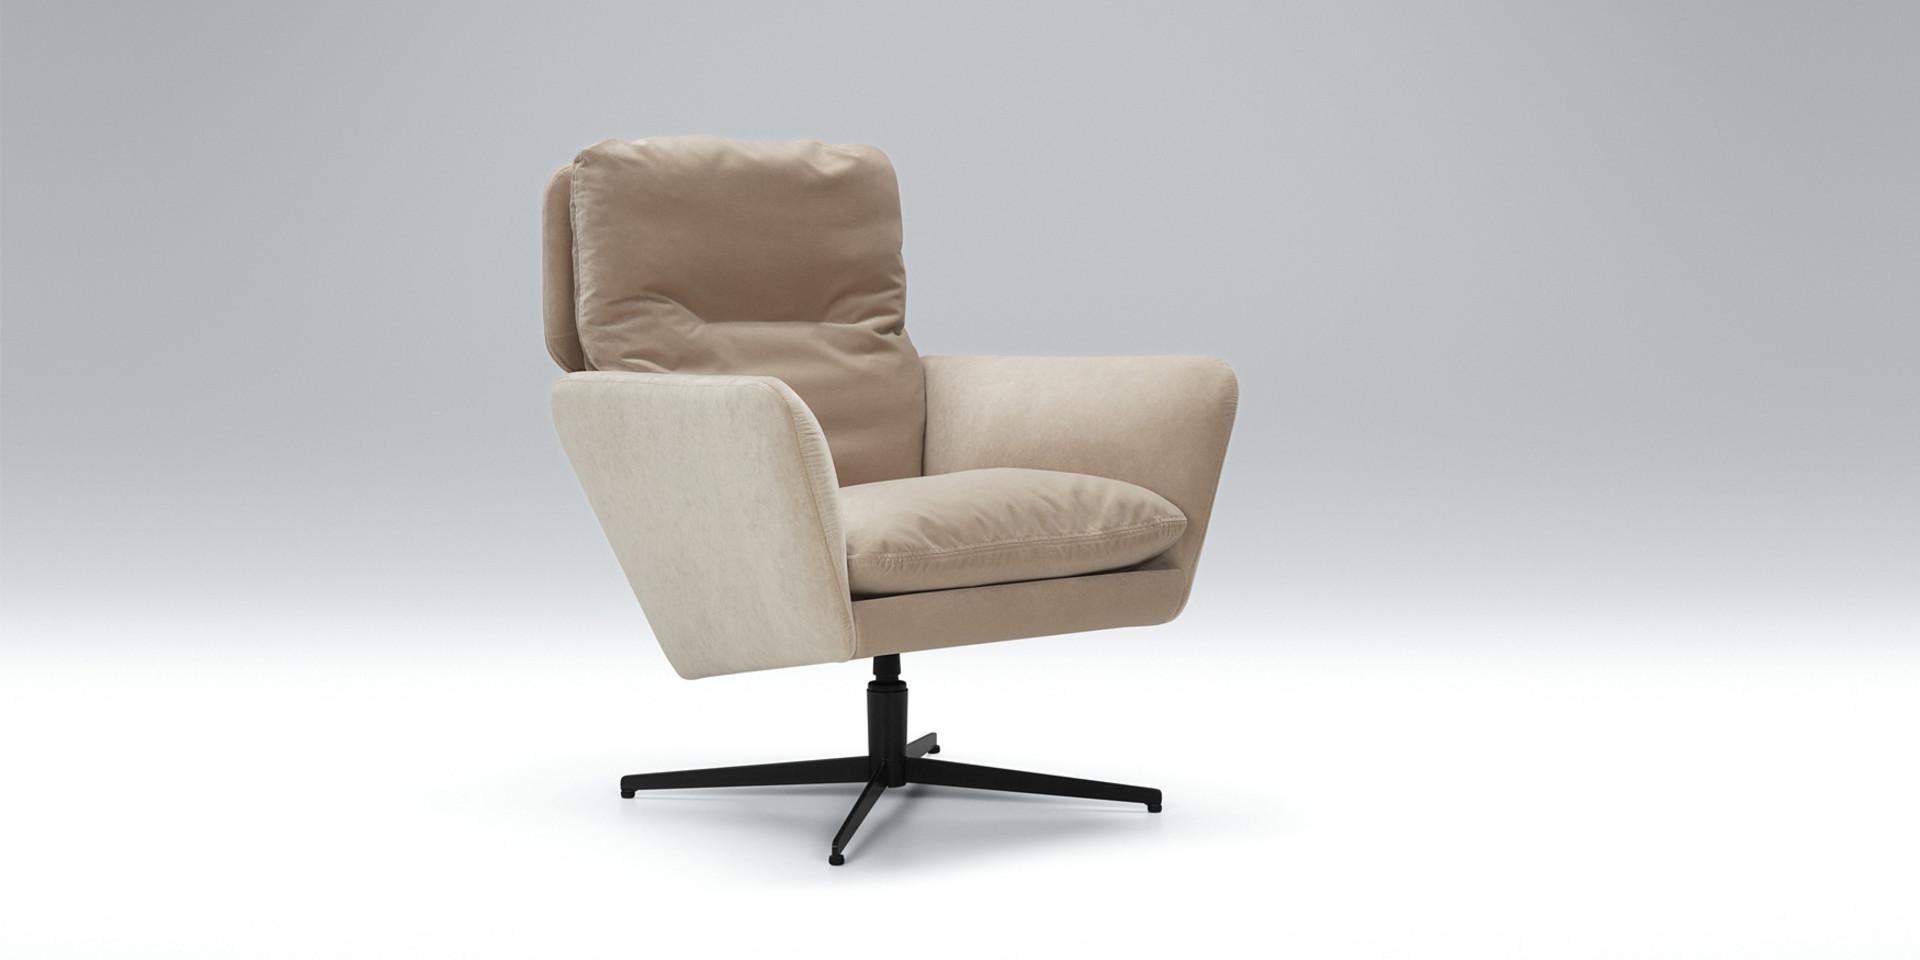 amy_armchair_classic_velvet_1_light-beige